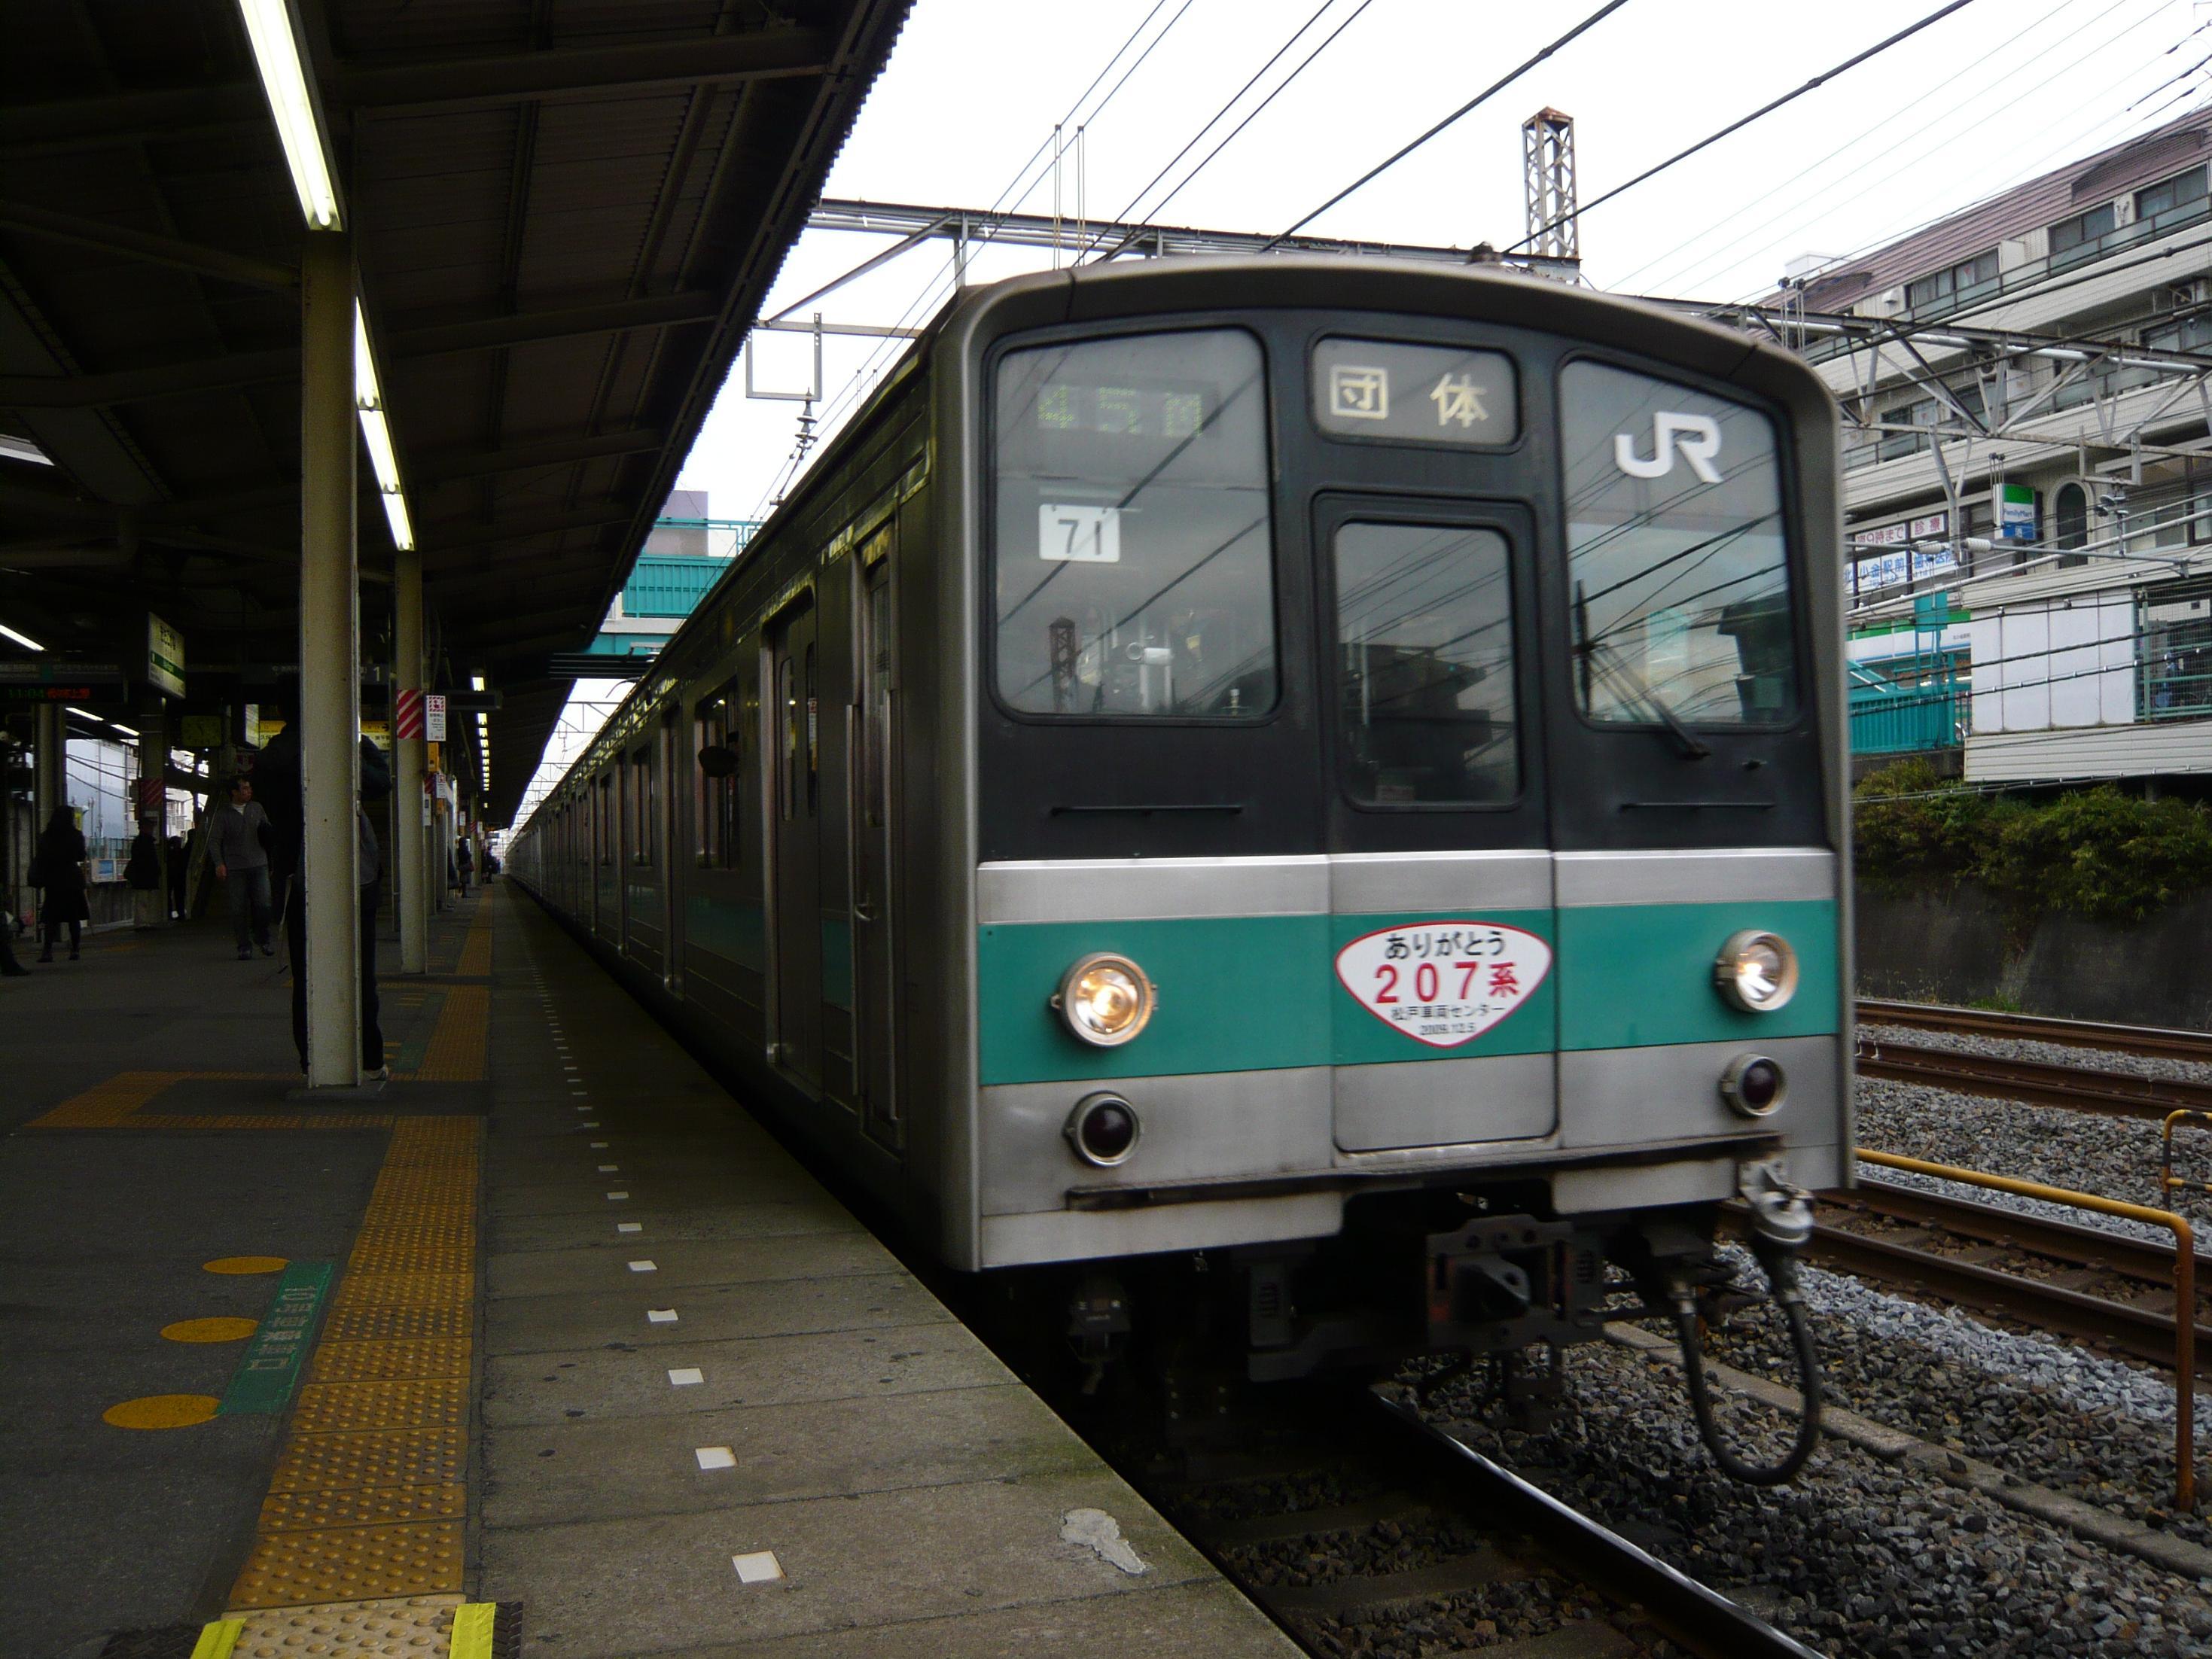 P1010763-2.JPG